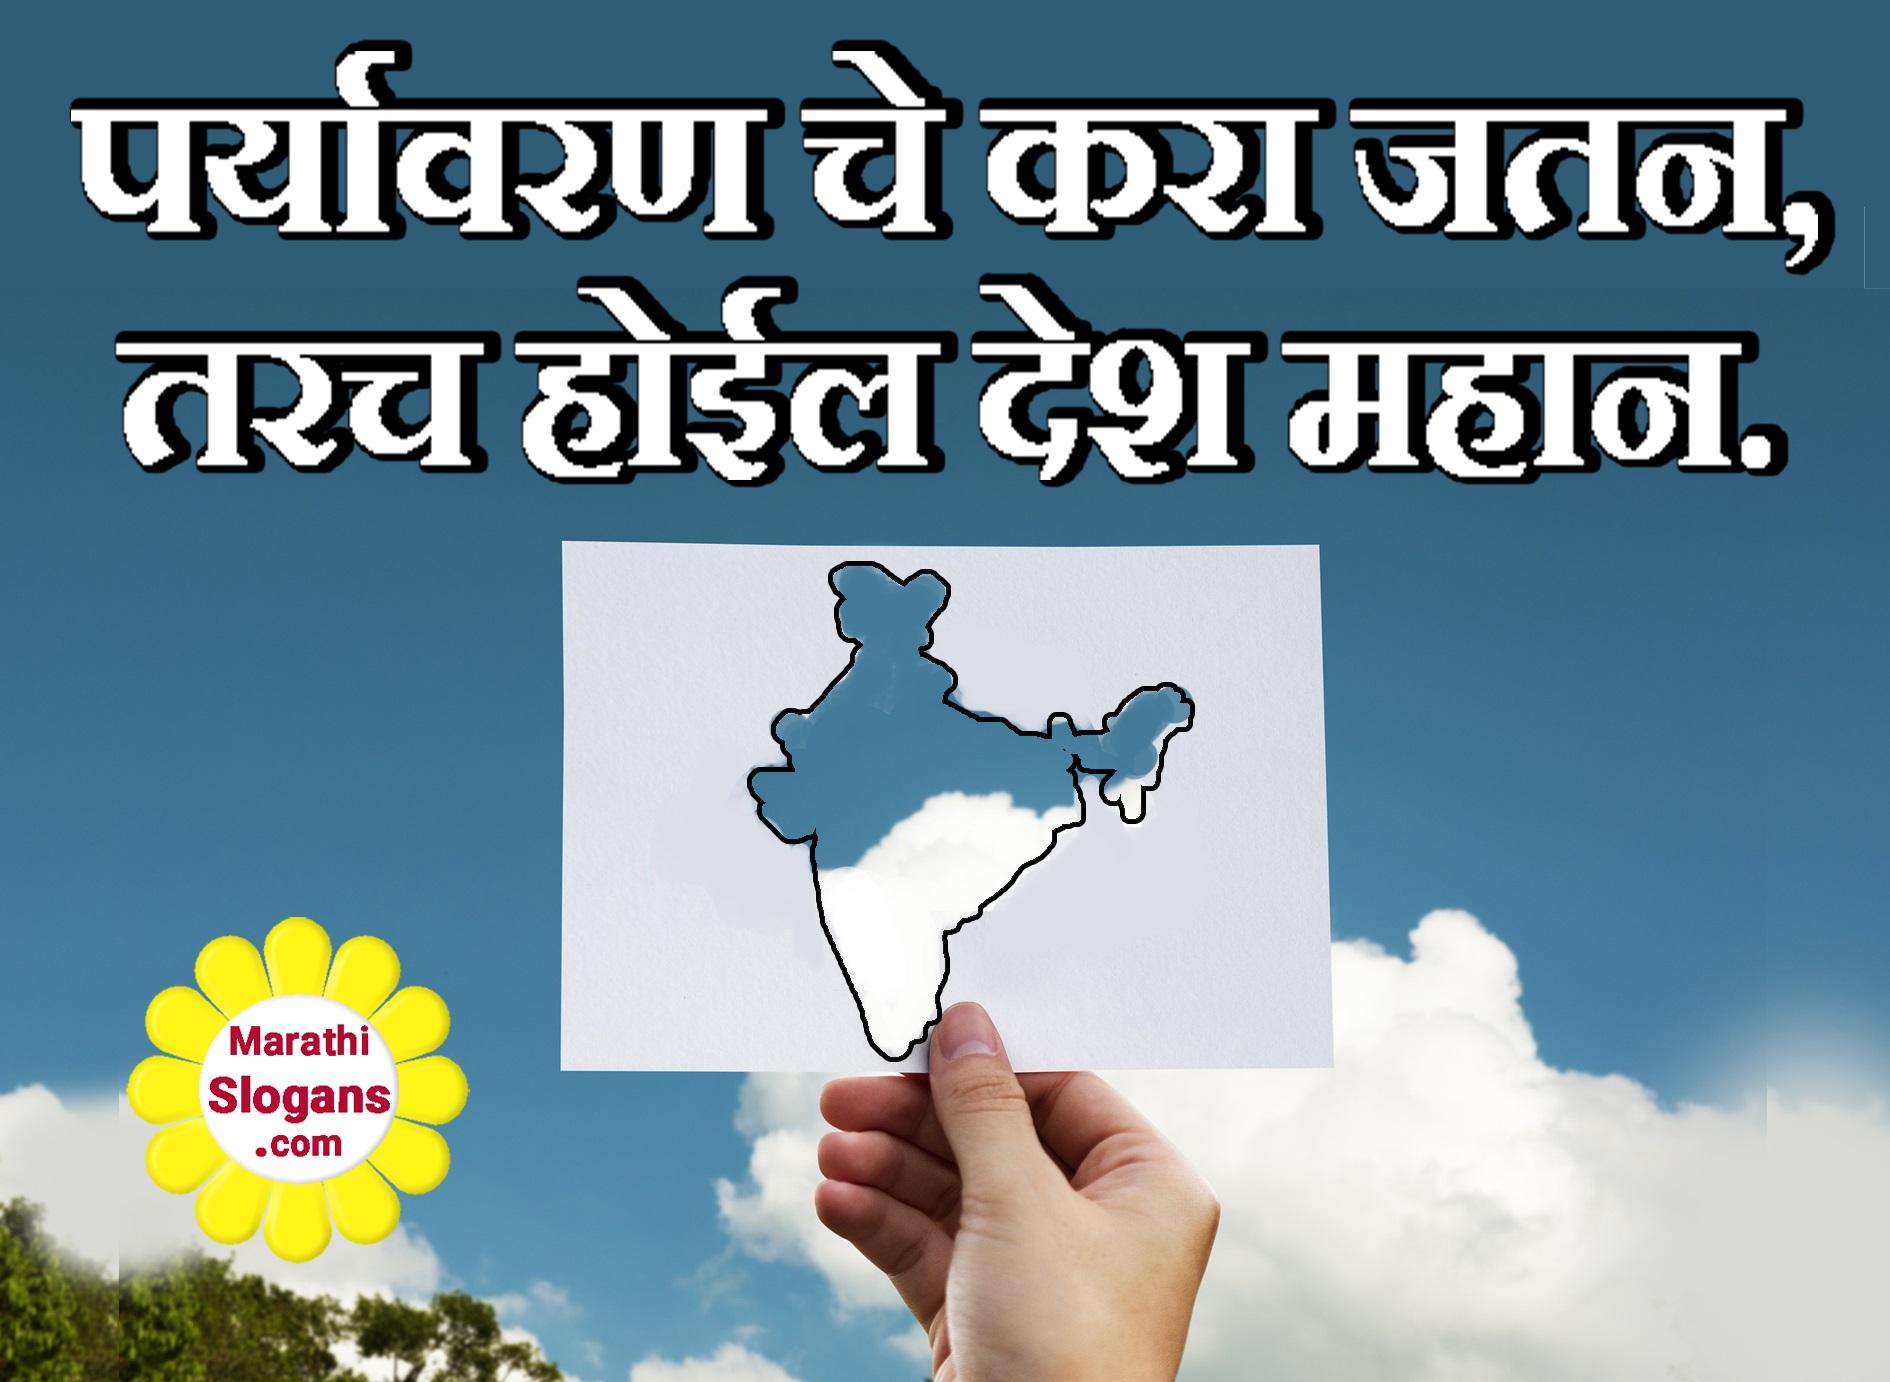 marathi slogan save trees Slogans on save trees in marathi language, slogans on save trees save earth, slogans on vriksharopan in hindi, slogans to save trees in hindi.